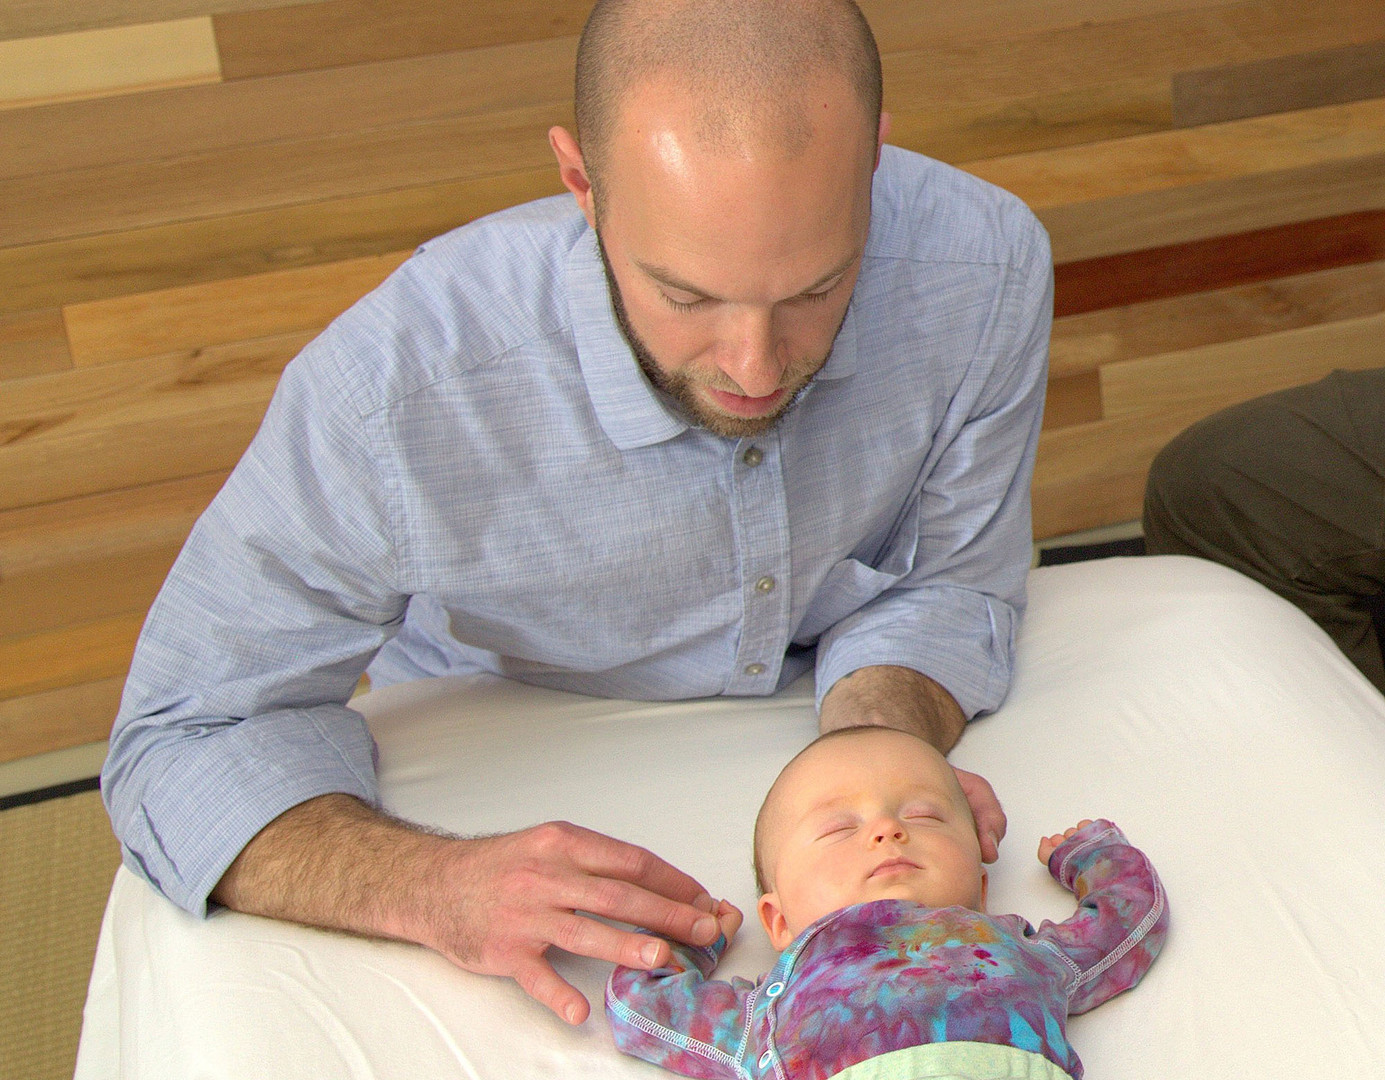 David A. Kaminker, LAc, MSOM,  pediatric acupuncture